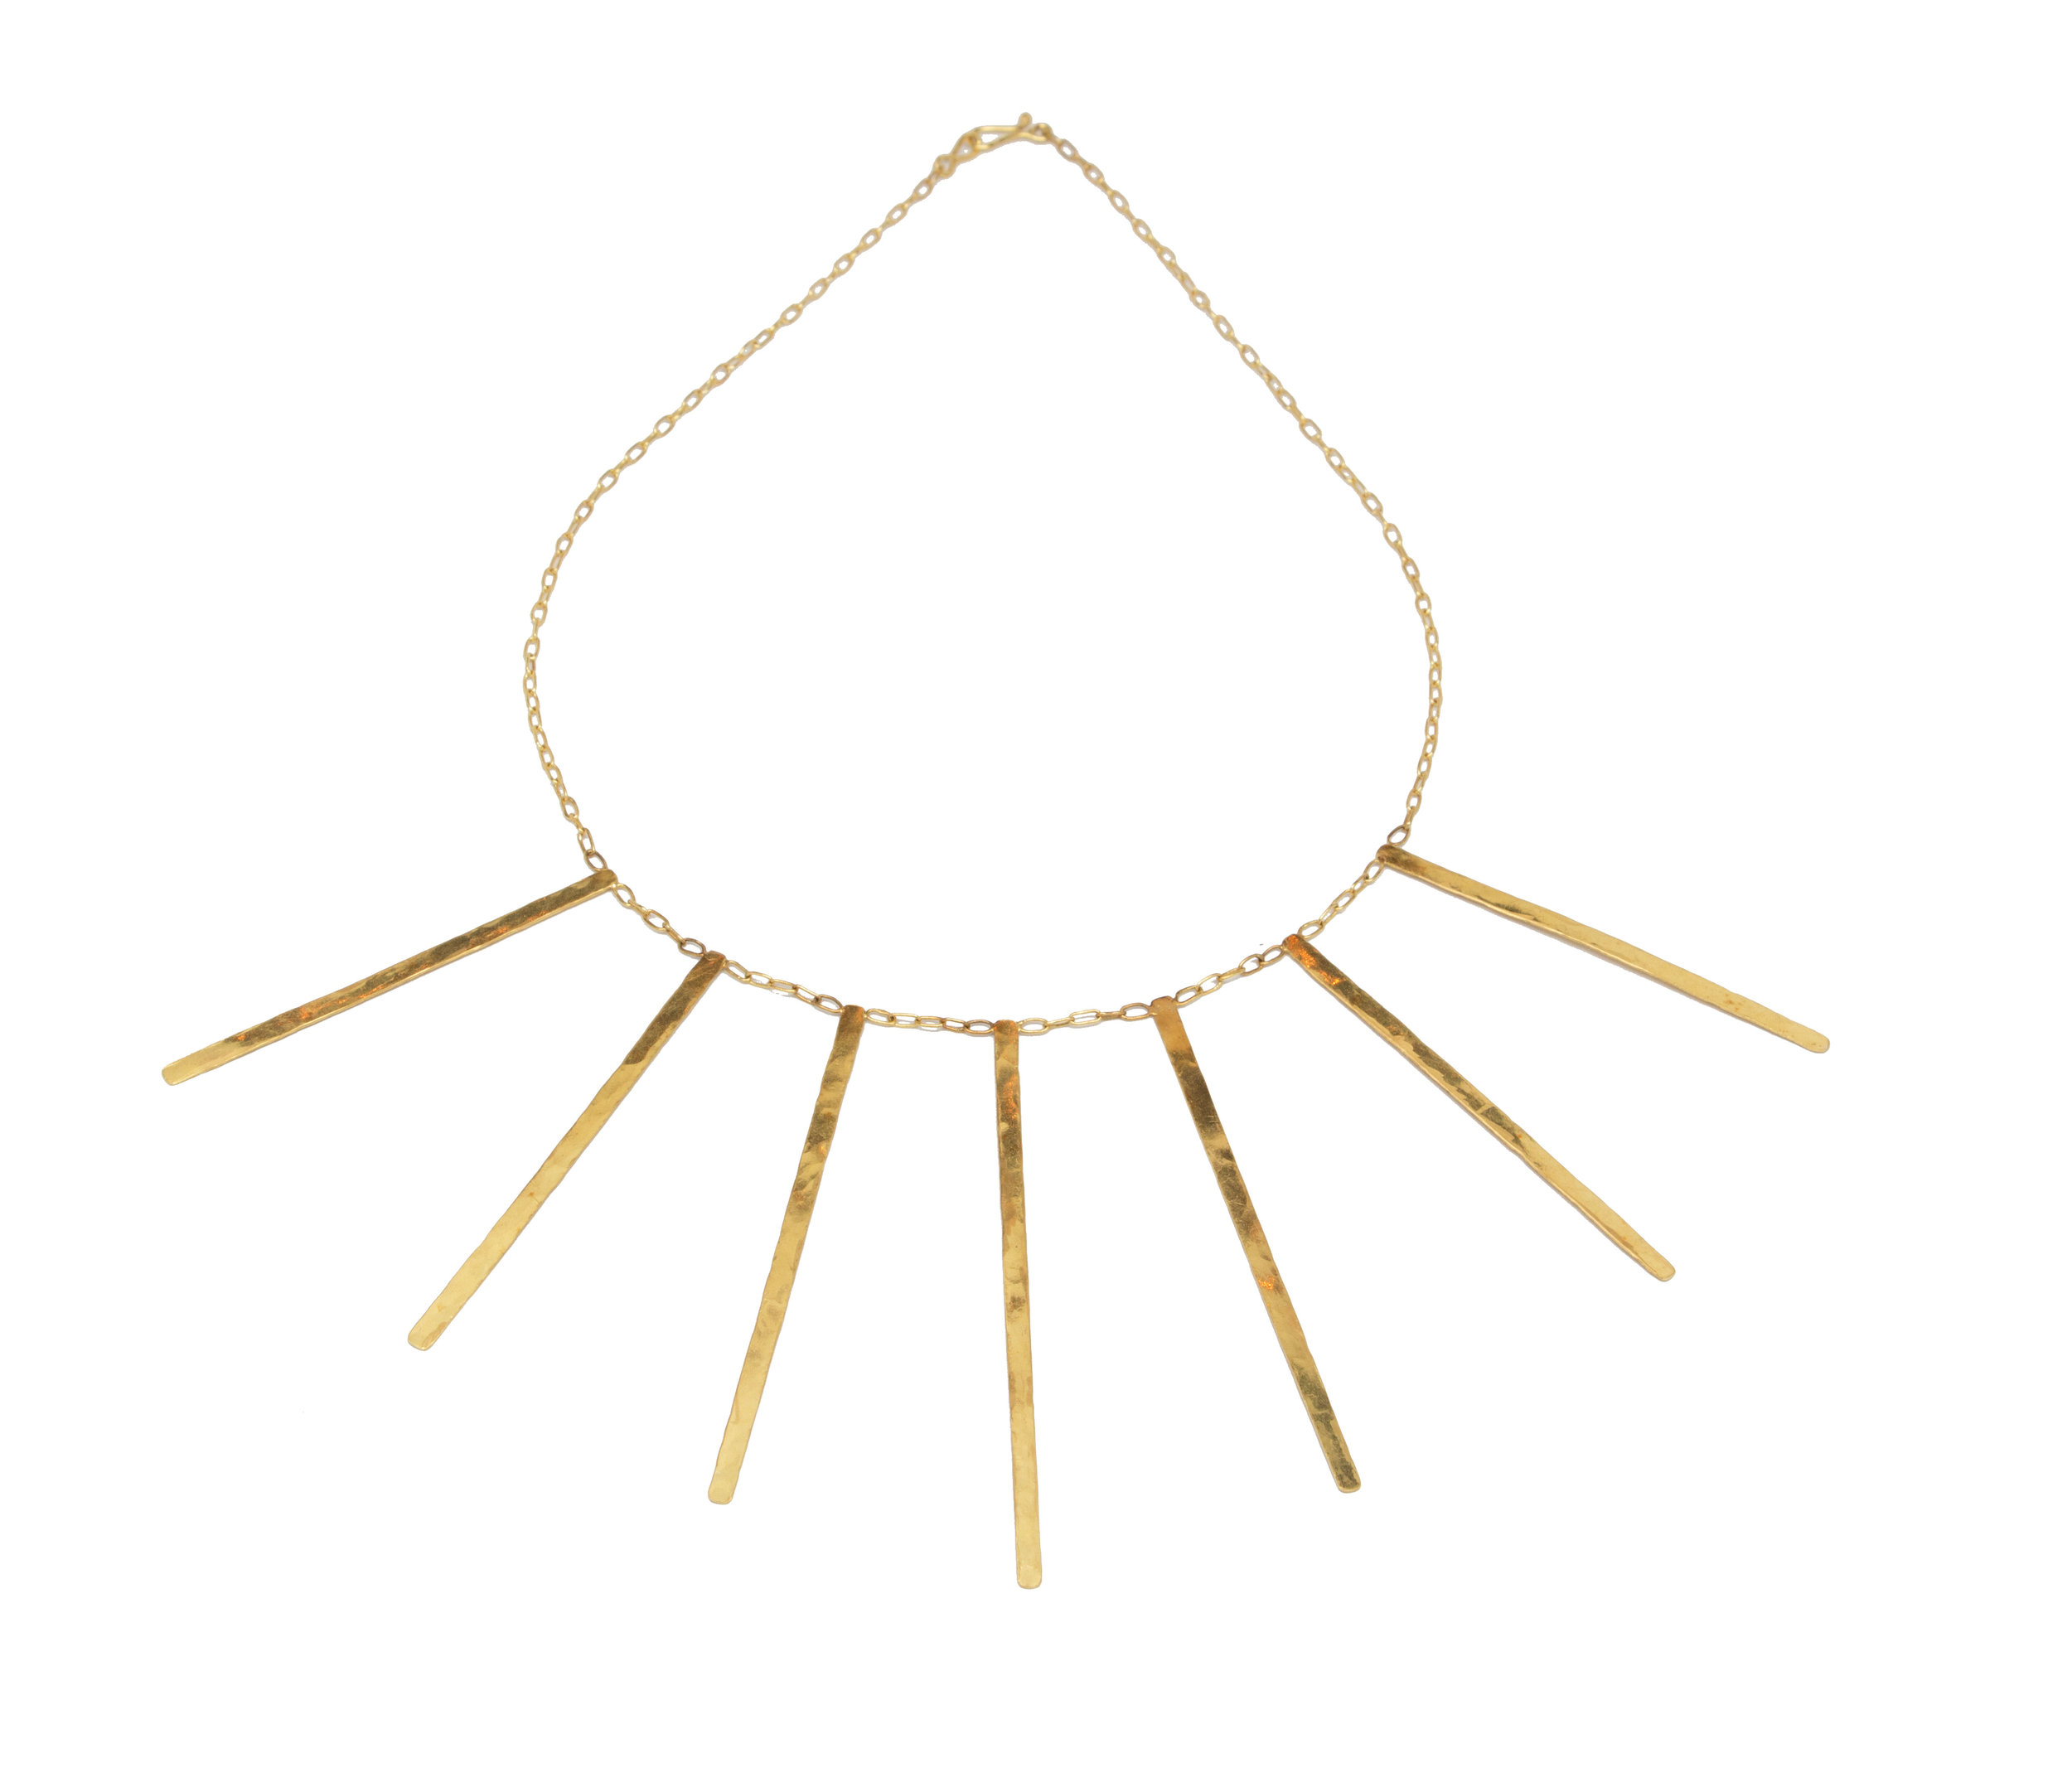 dec20 jewelry4-527.jpg